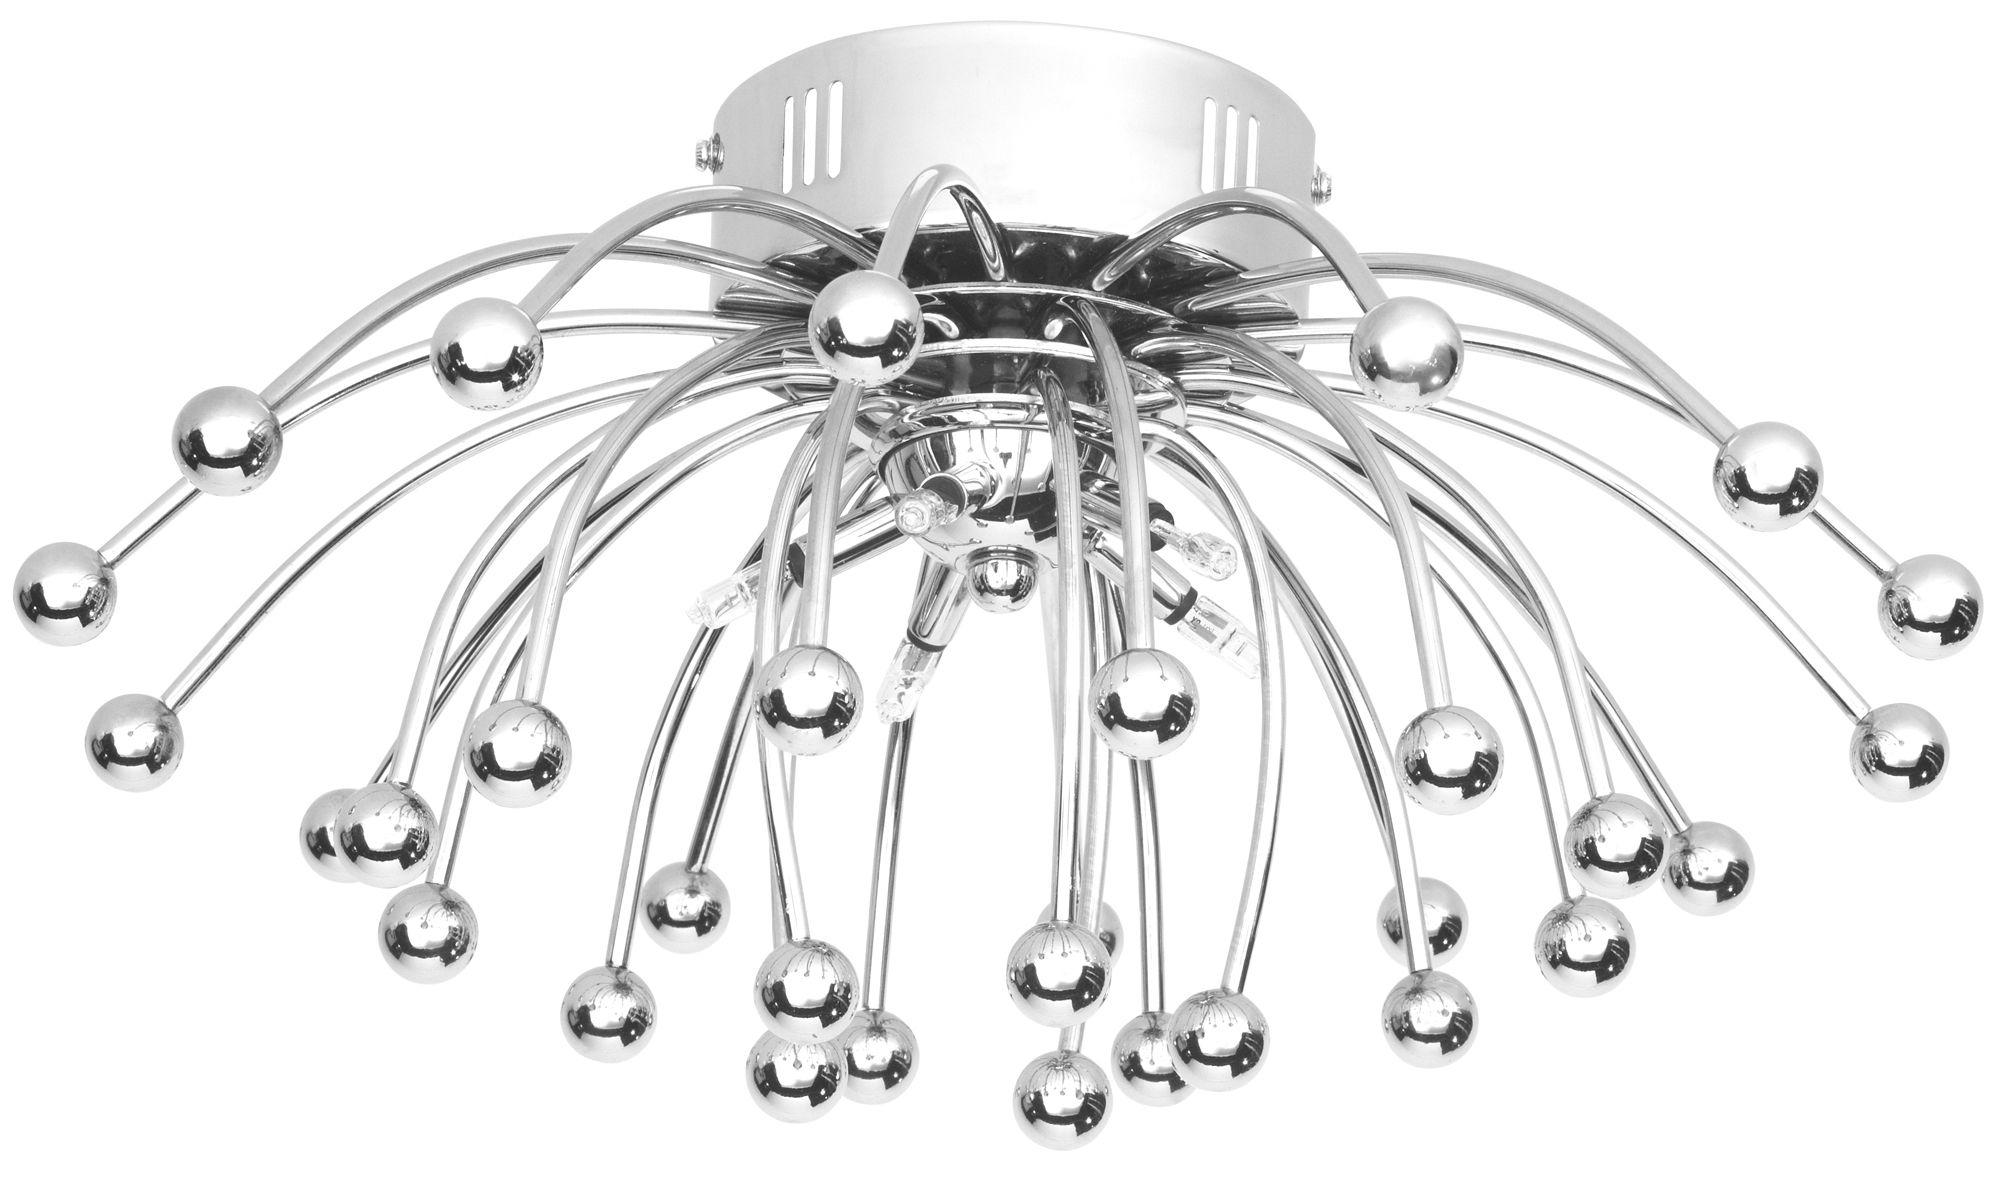 Anemone Sphere Silver Chrome Effect 5 L& Ceiling Light | Departments | DIY at Bu0026Q  sc 1 st  Bu0026Q & Anemone Sphere Silver Chrome Effect 5 Lamp Ceiling Light ...